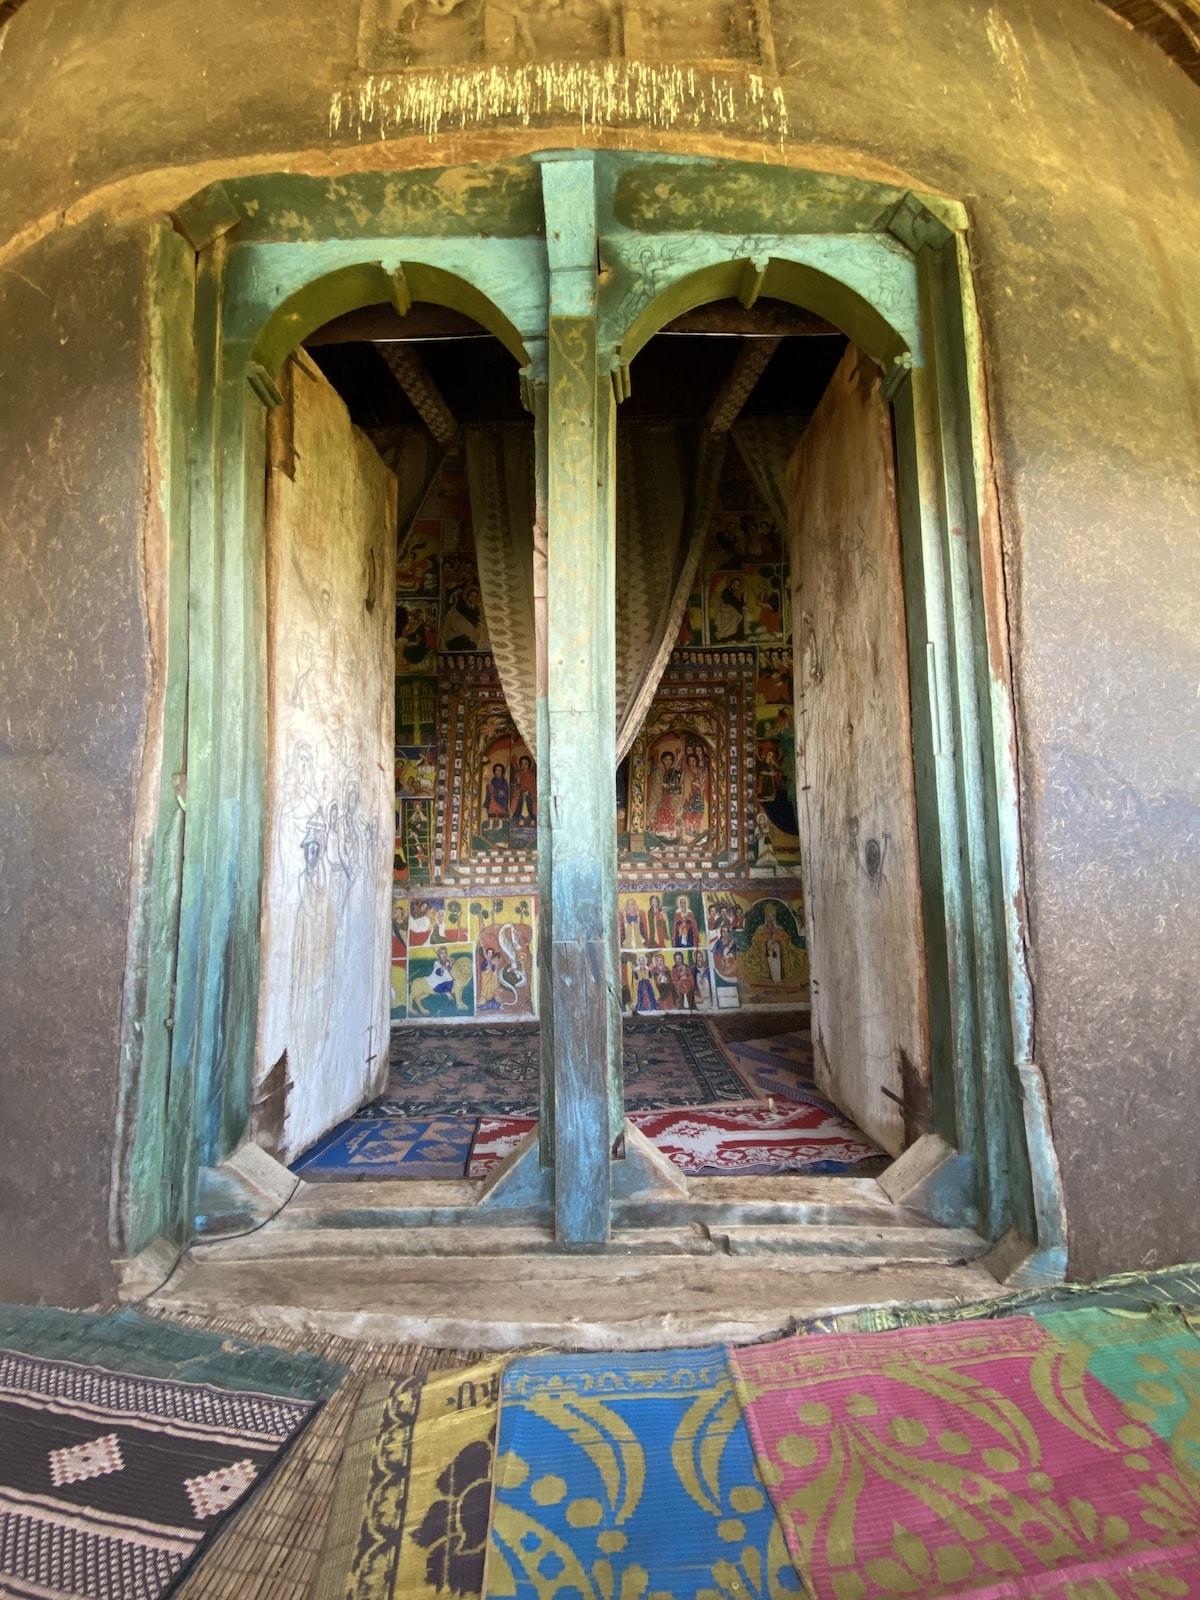 Zege, Ethiopia